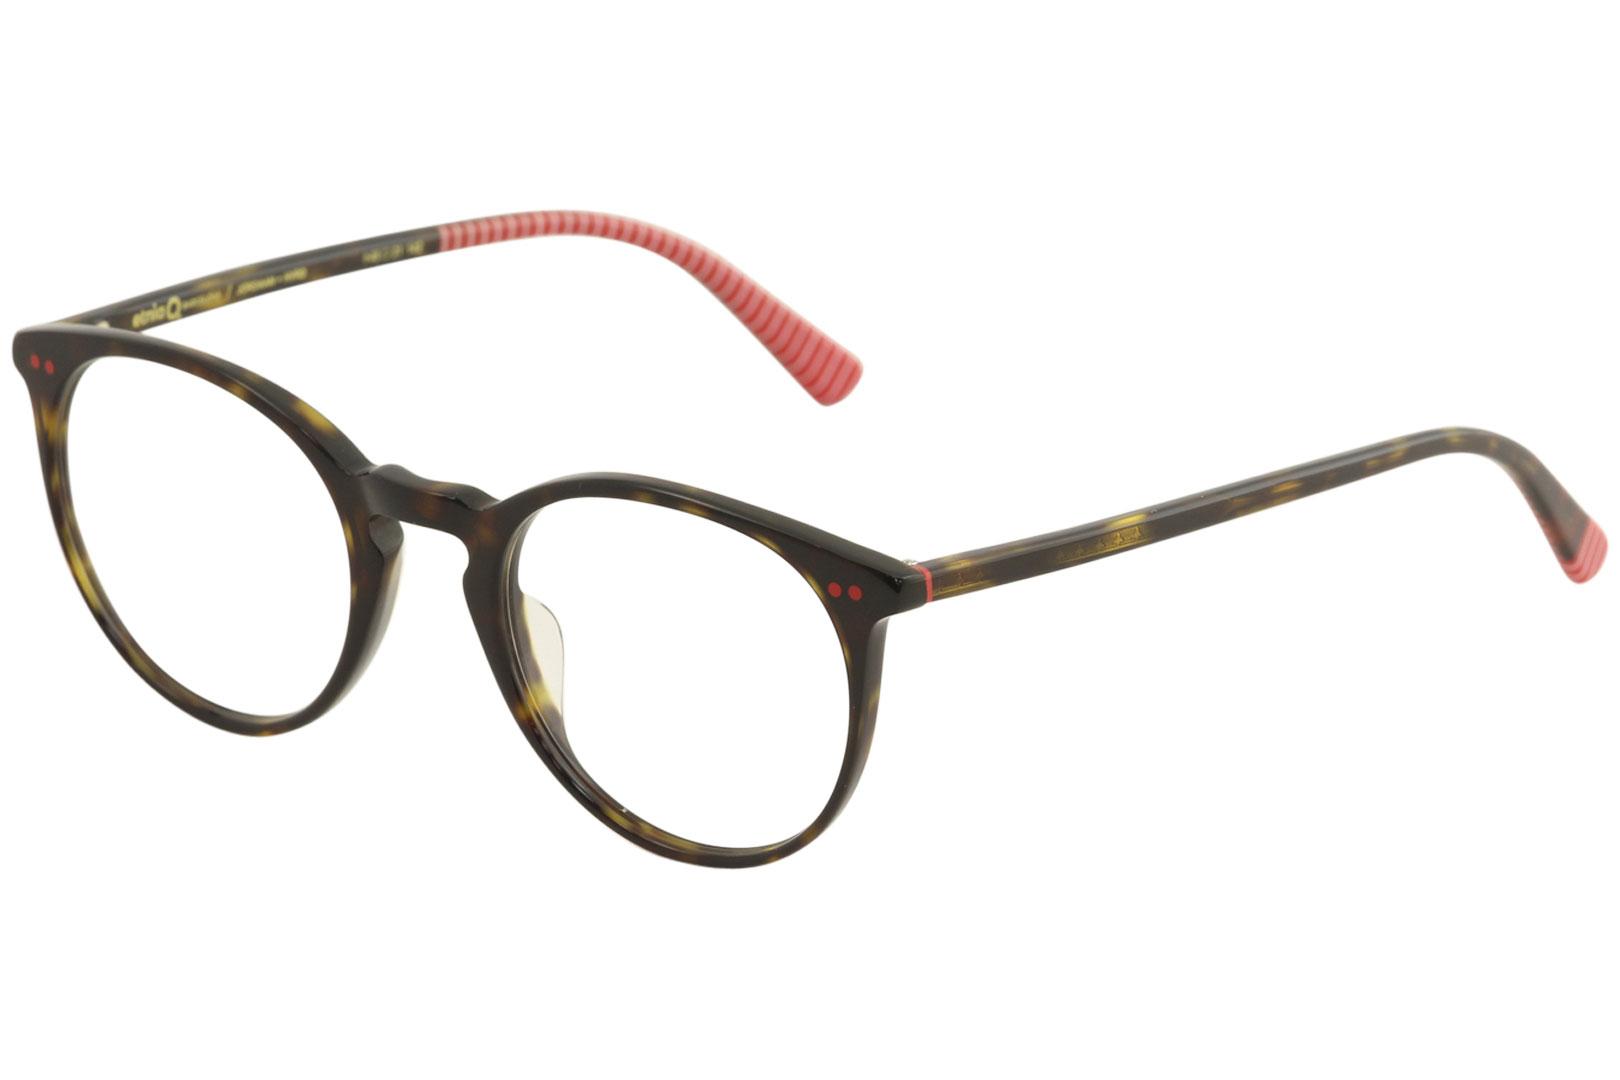 0b4cab9907 Etnia Barcelona Women s Eyeglasses Jordaan HVRD Havana Red Optical ...